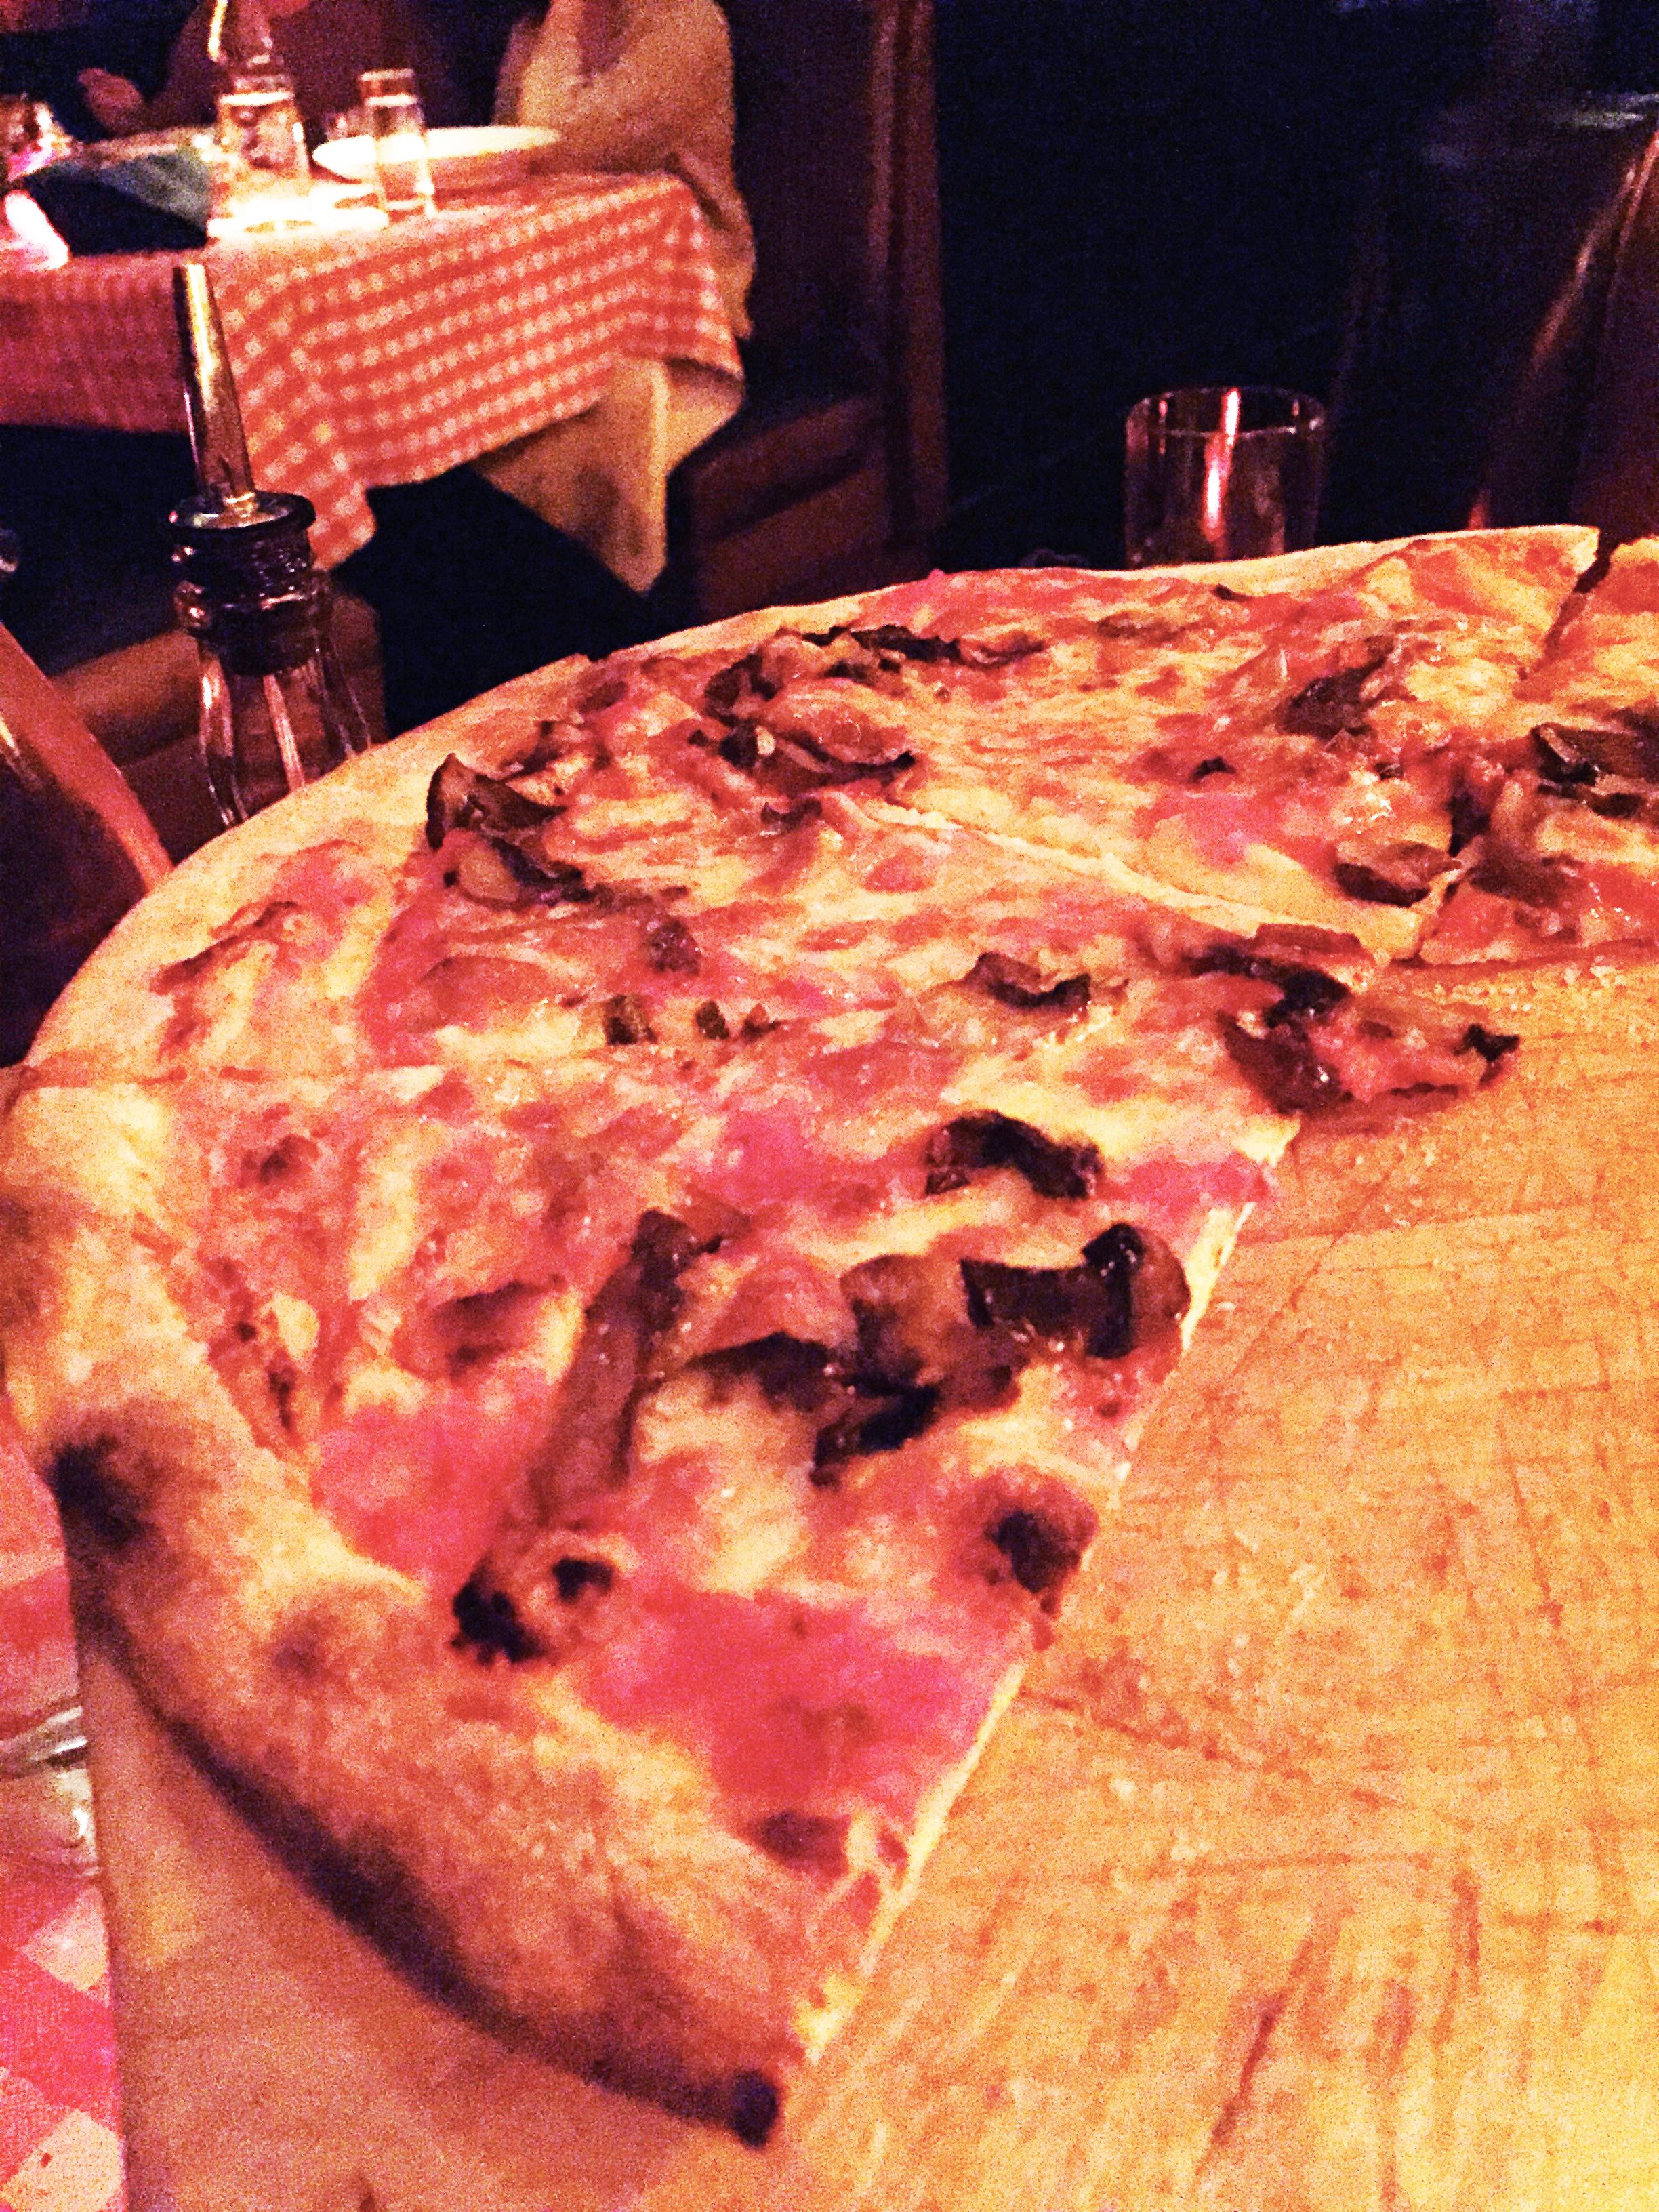 Funghi Pizza with San Marzano tomato sauce, mozzarella, and seasonal mushrooms.